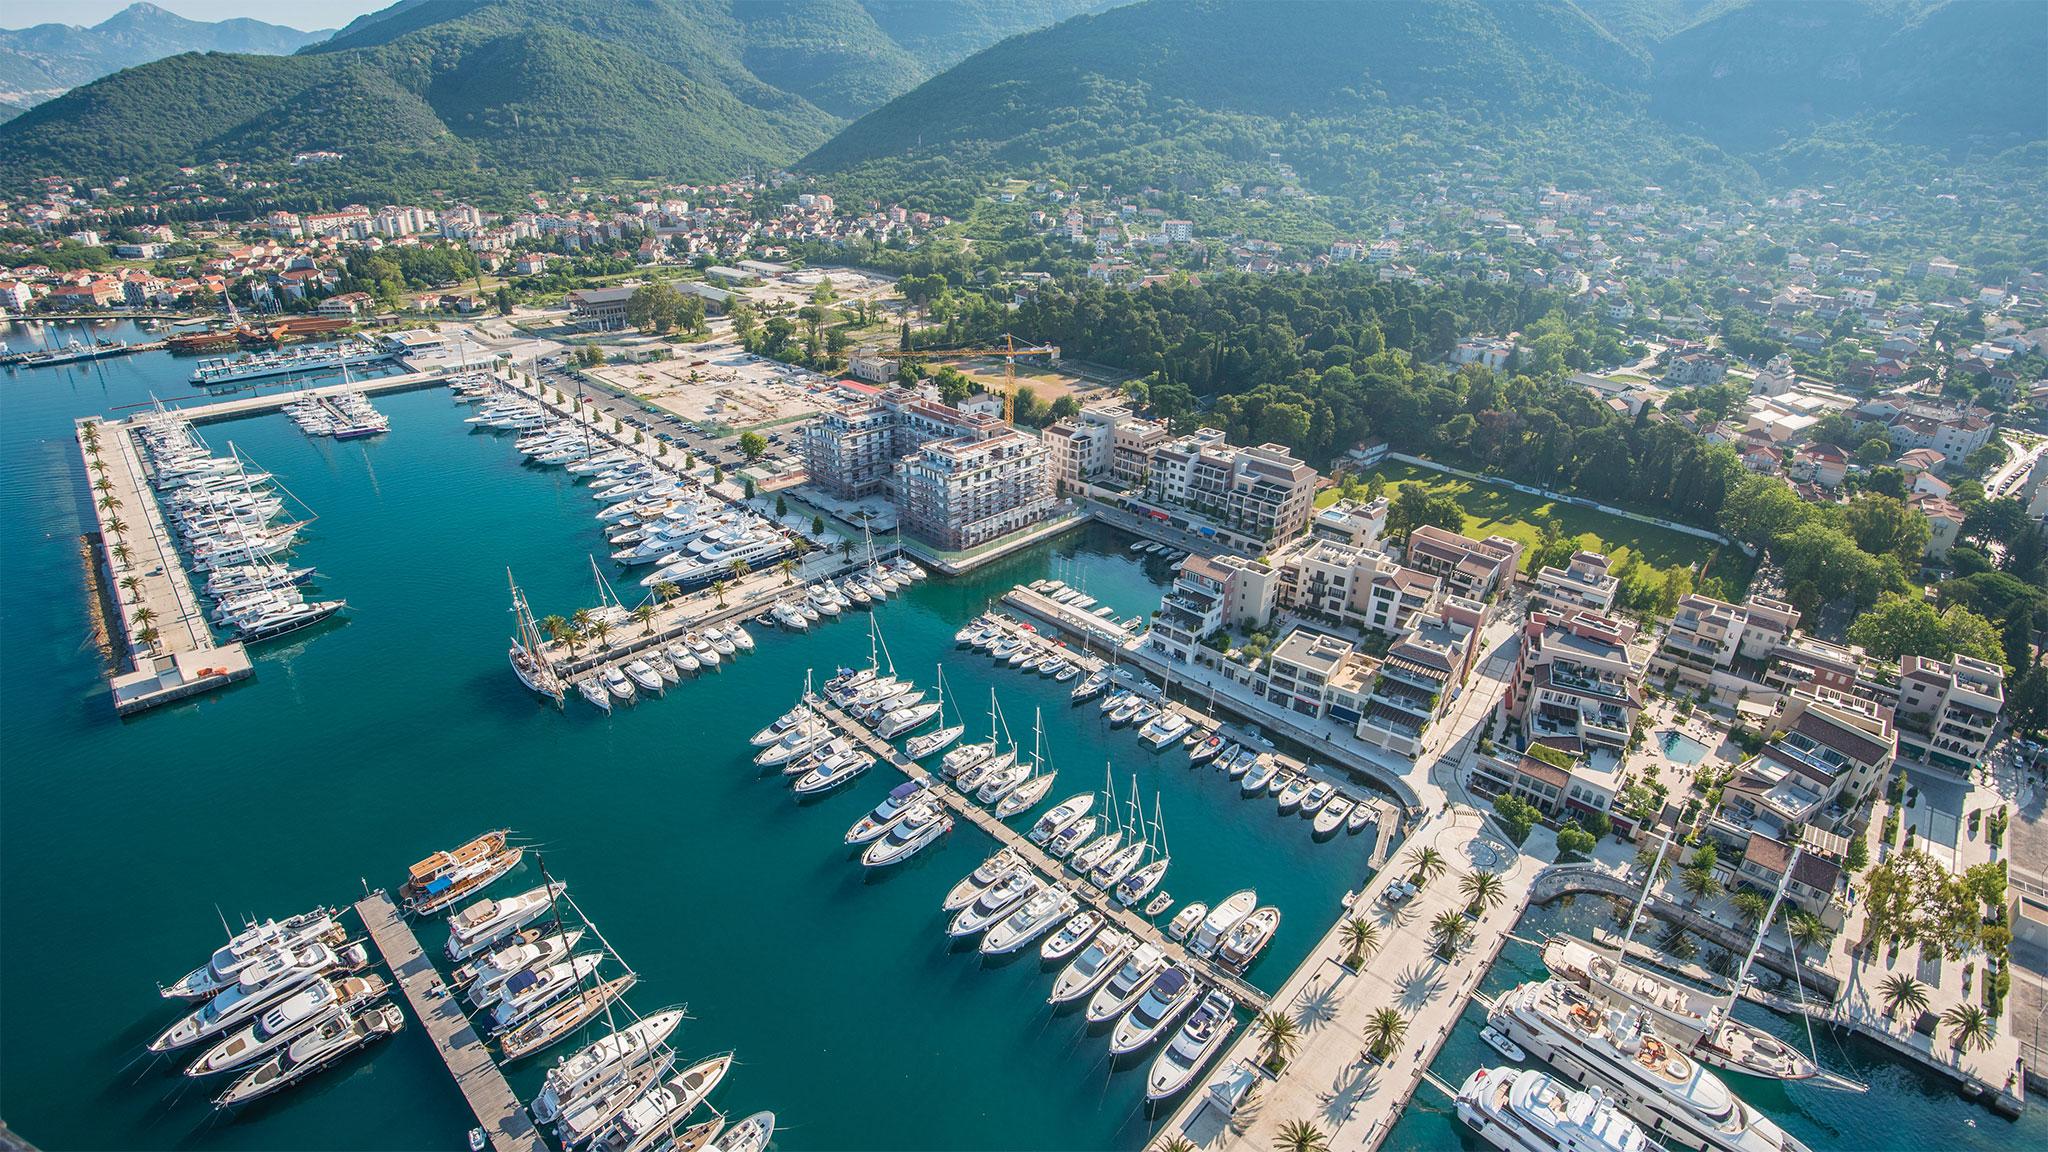 Porto Montenegro A Haven For Billionaires Yachts